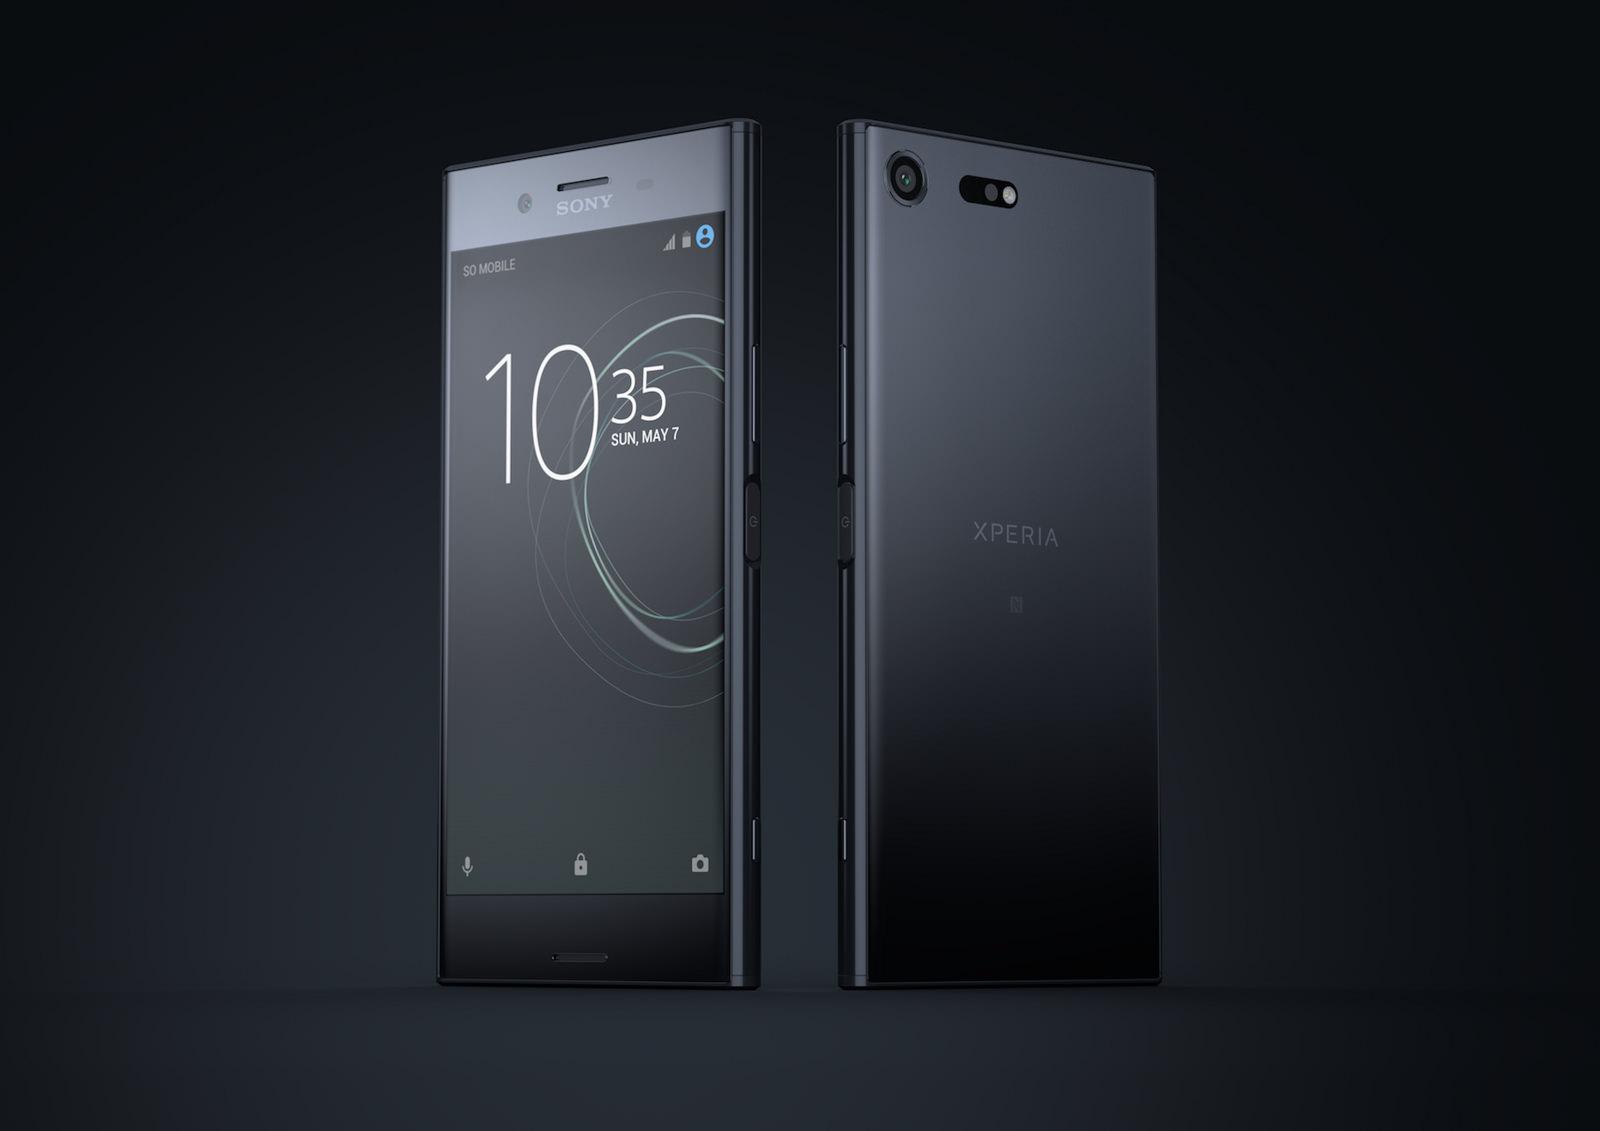 Sony Xperia XZ premium Black Friday deals